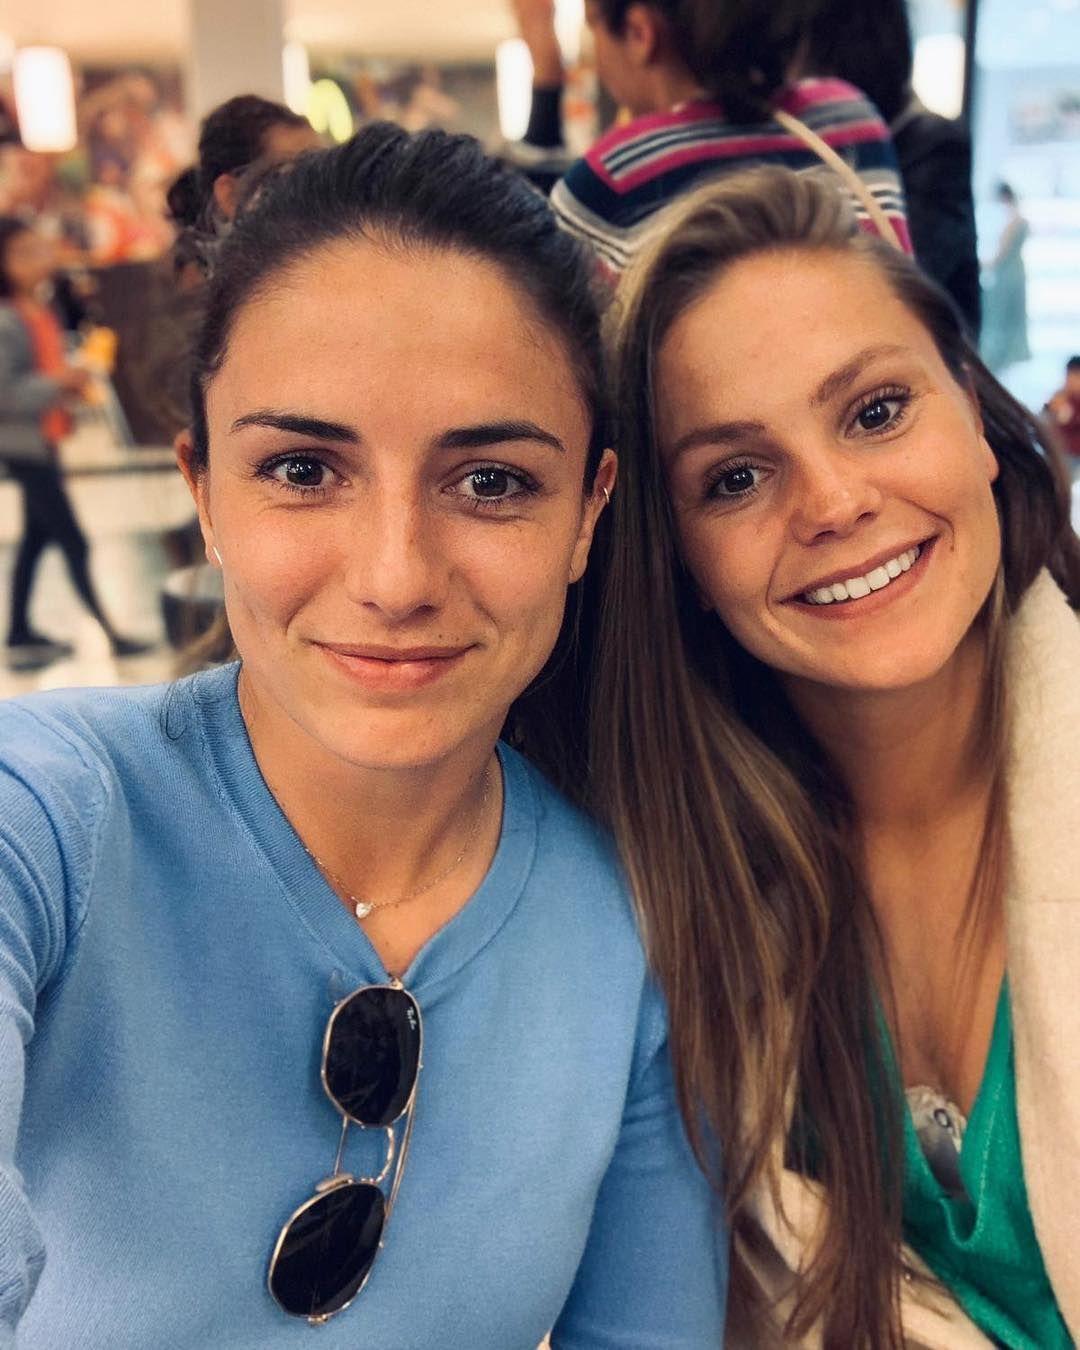 Lieke Martens Instagram Com Another Fan Popping To See Me In Barcelona Vrouwenvoetbal Meisjes Voetbal Voetbalvrouwen